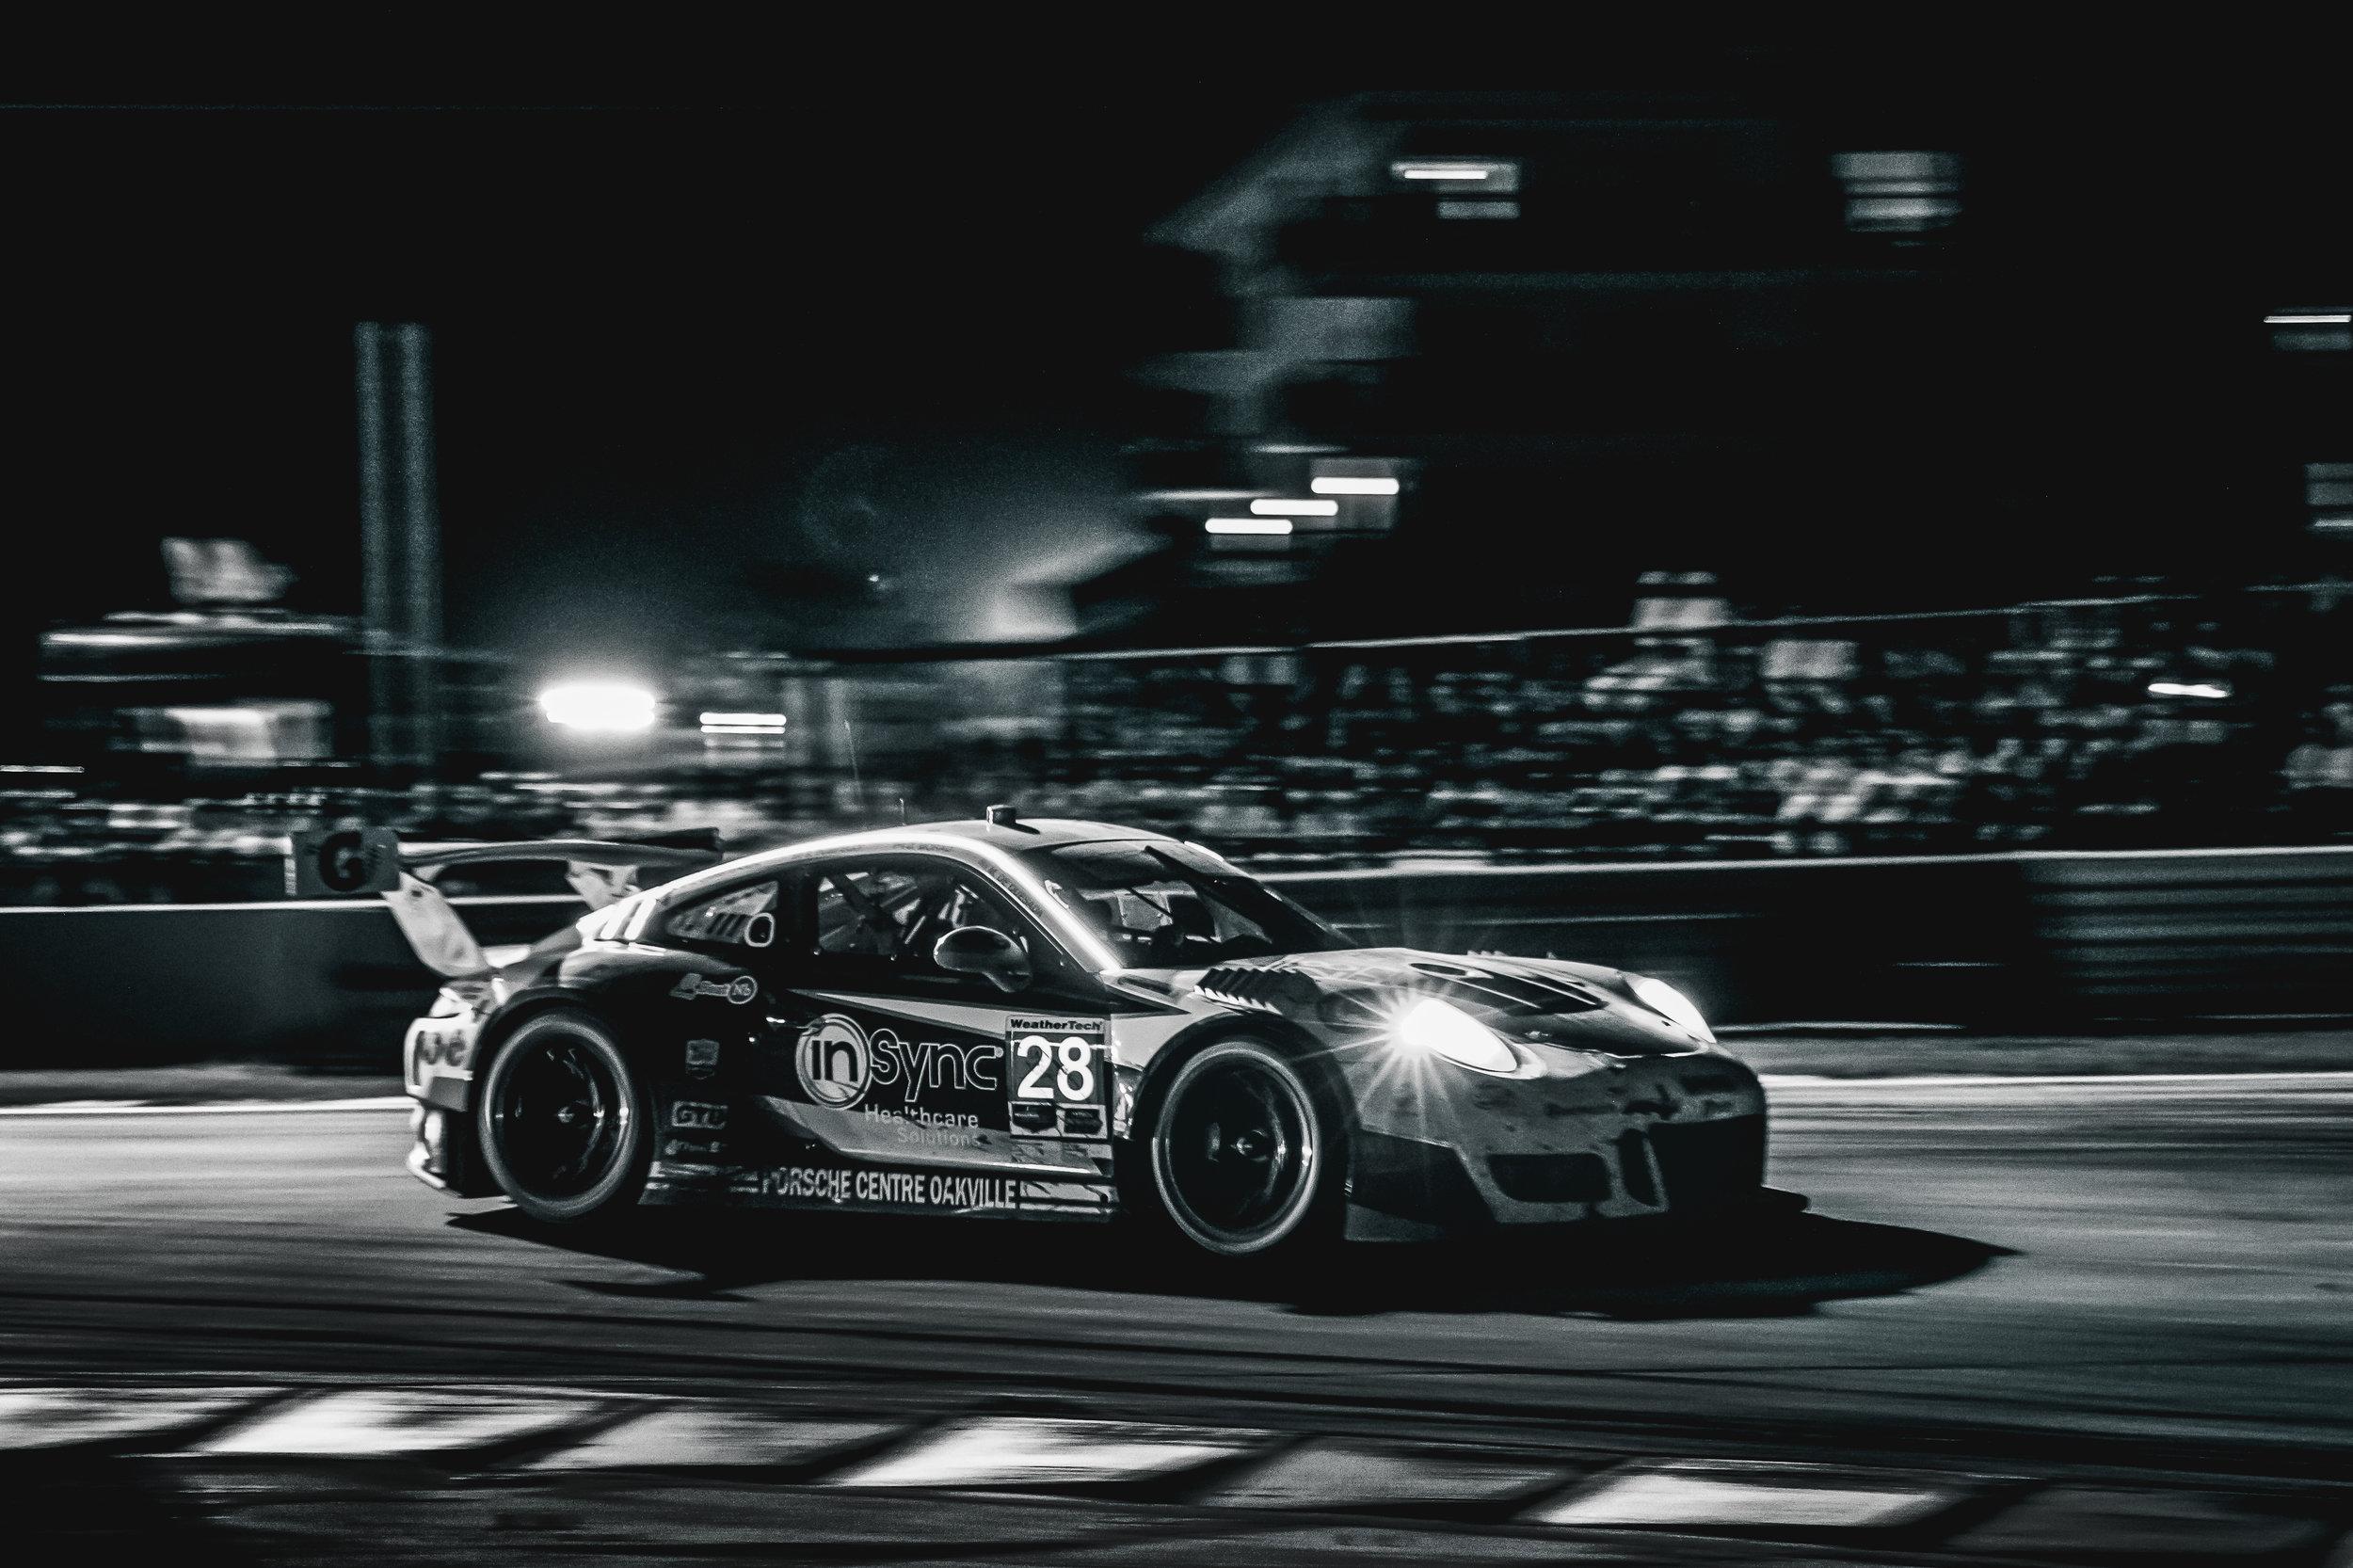 IMSA - 12 Hours of Sebring - Alegra Motorsports.jpg